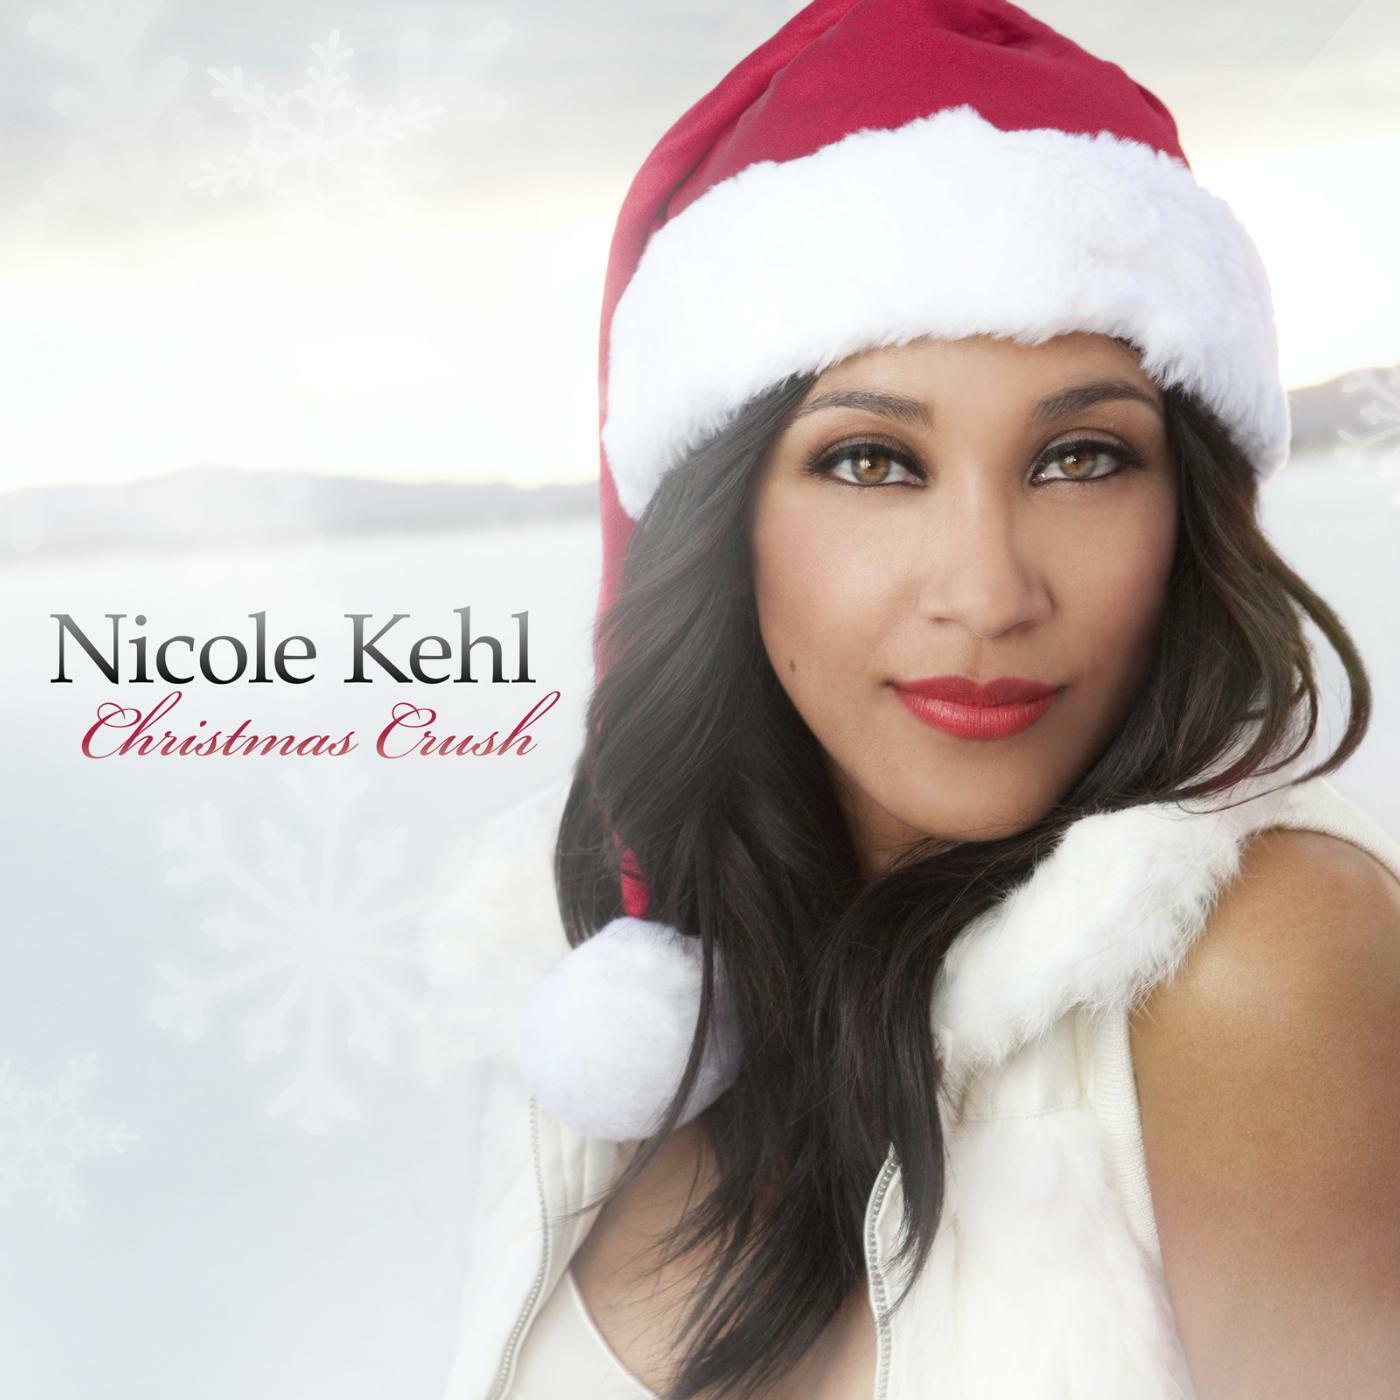 Listen Free to Nicole Kehl - Christmas Crush Radio on iHeartRadio ...